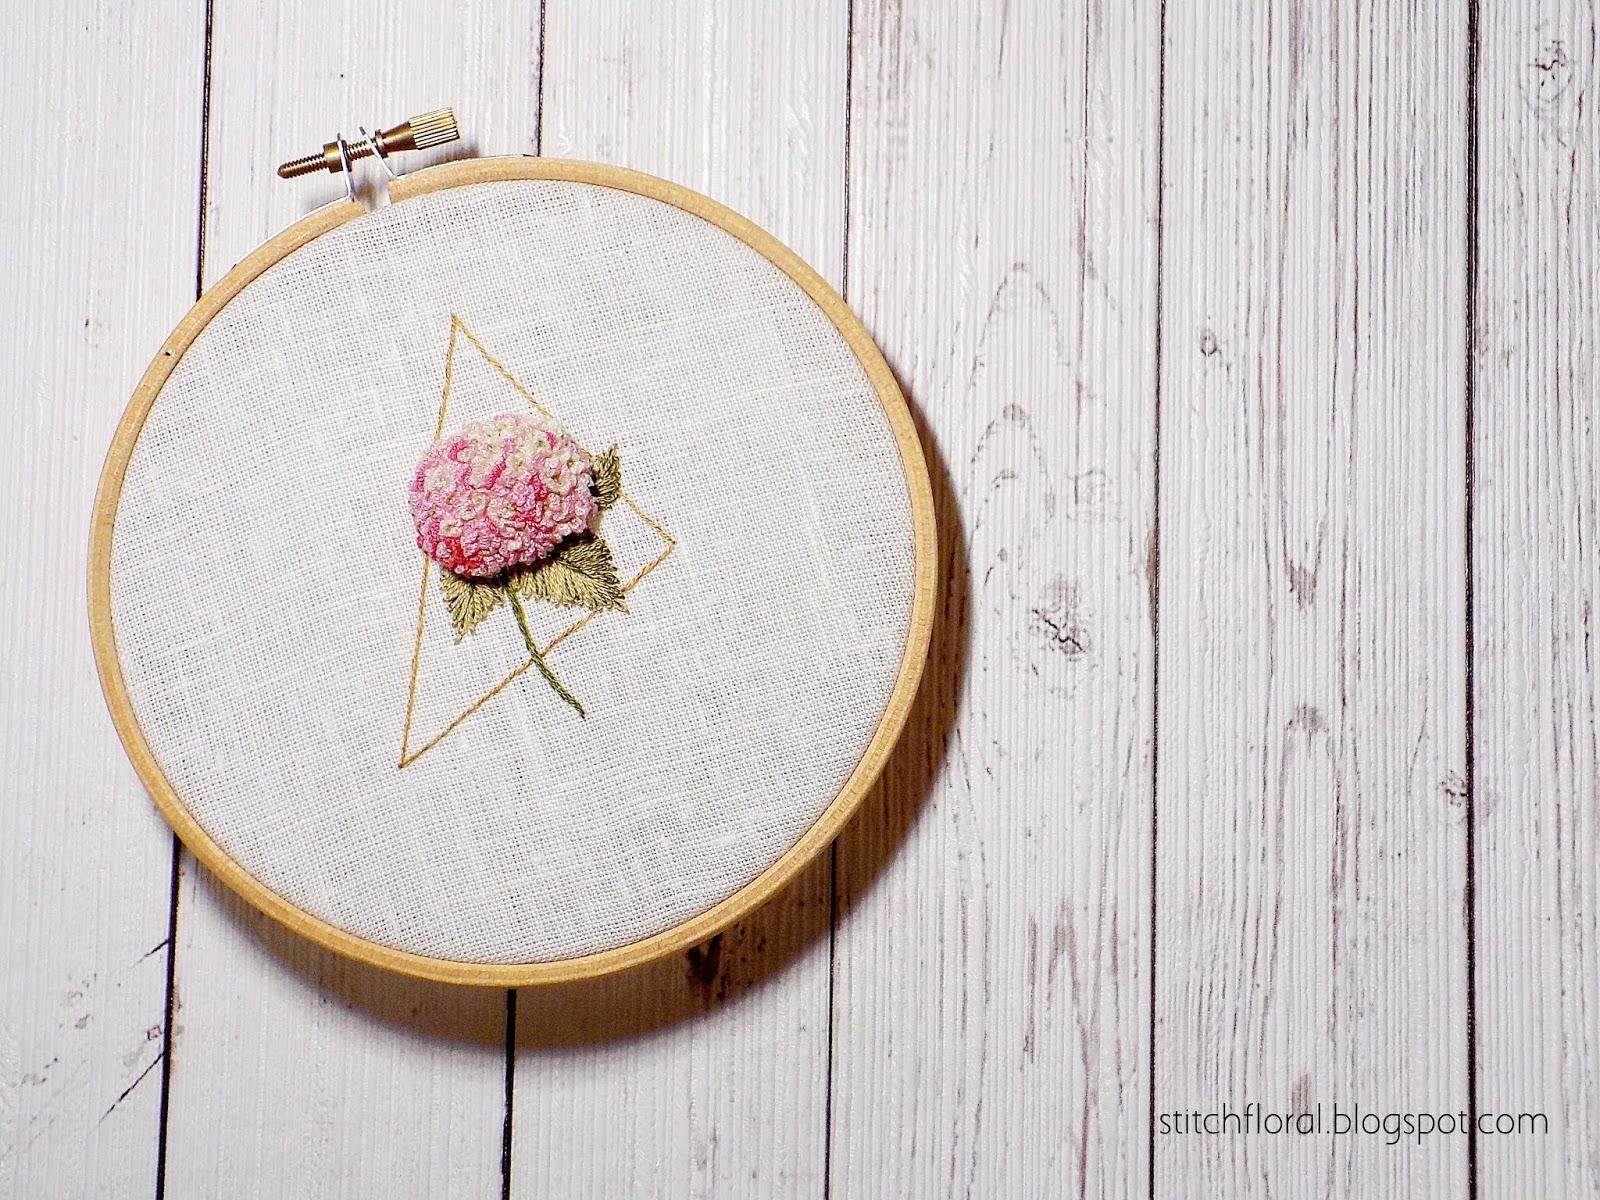 Hydrangea embroidery tutorial